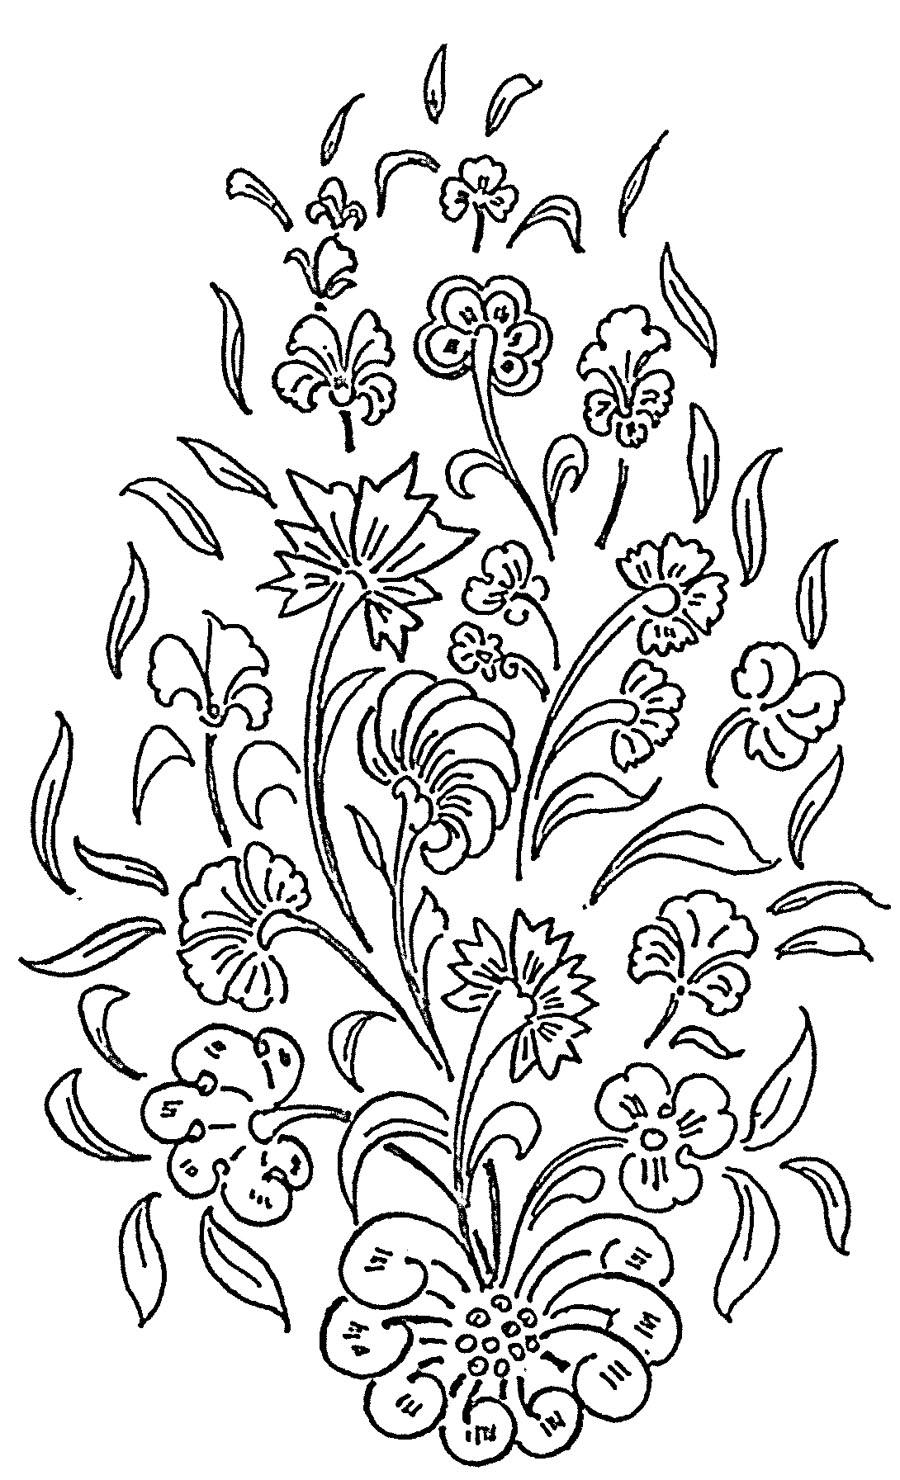 Glass Flower Designs Patterns